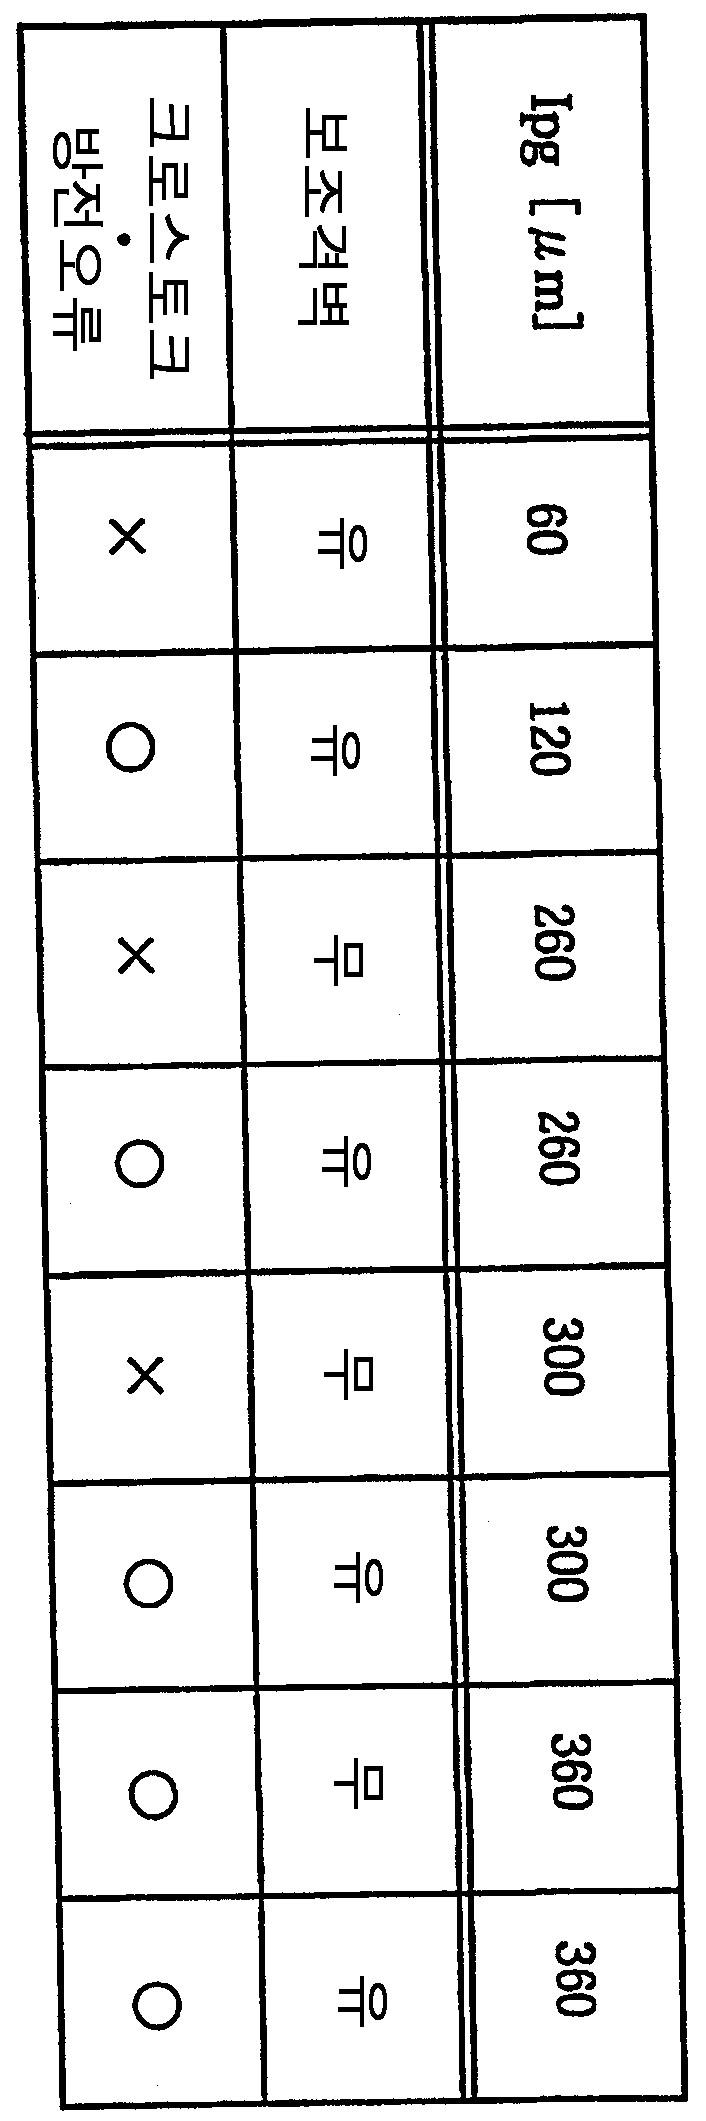 Figure 112008020582144-pat00126